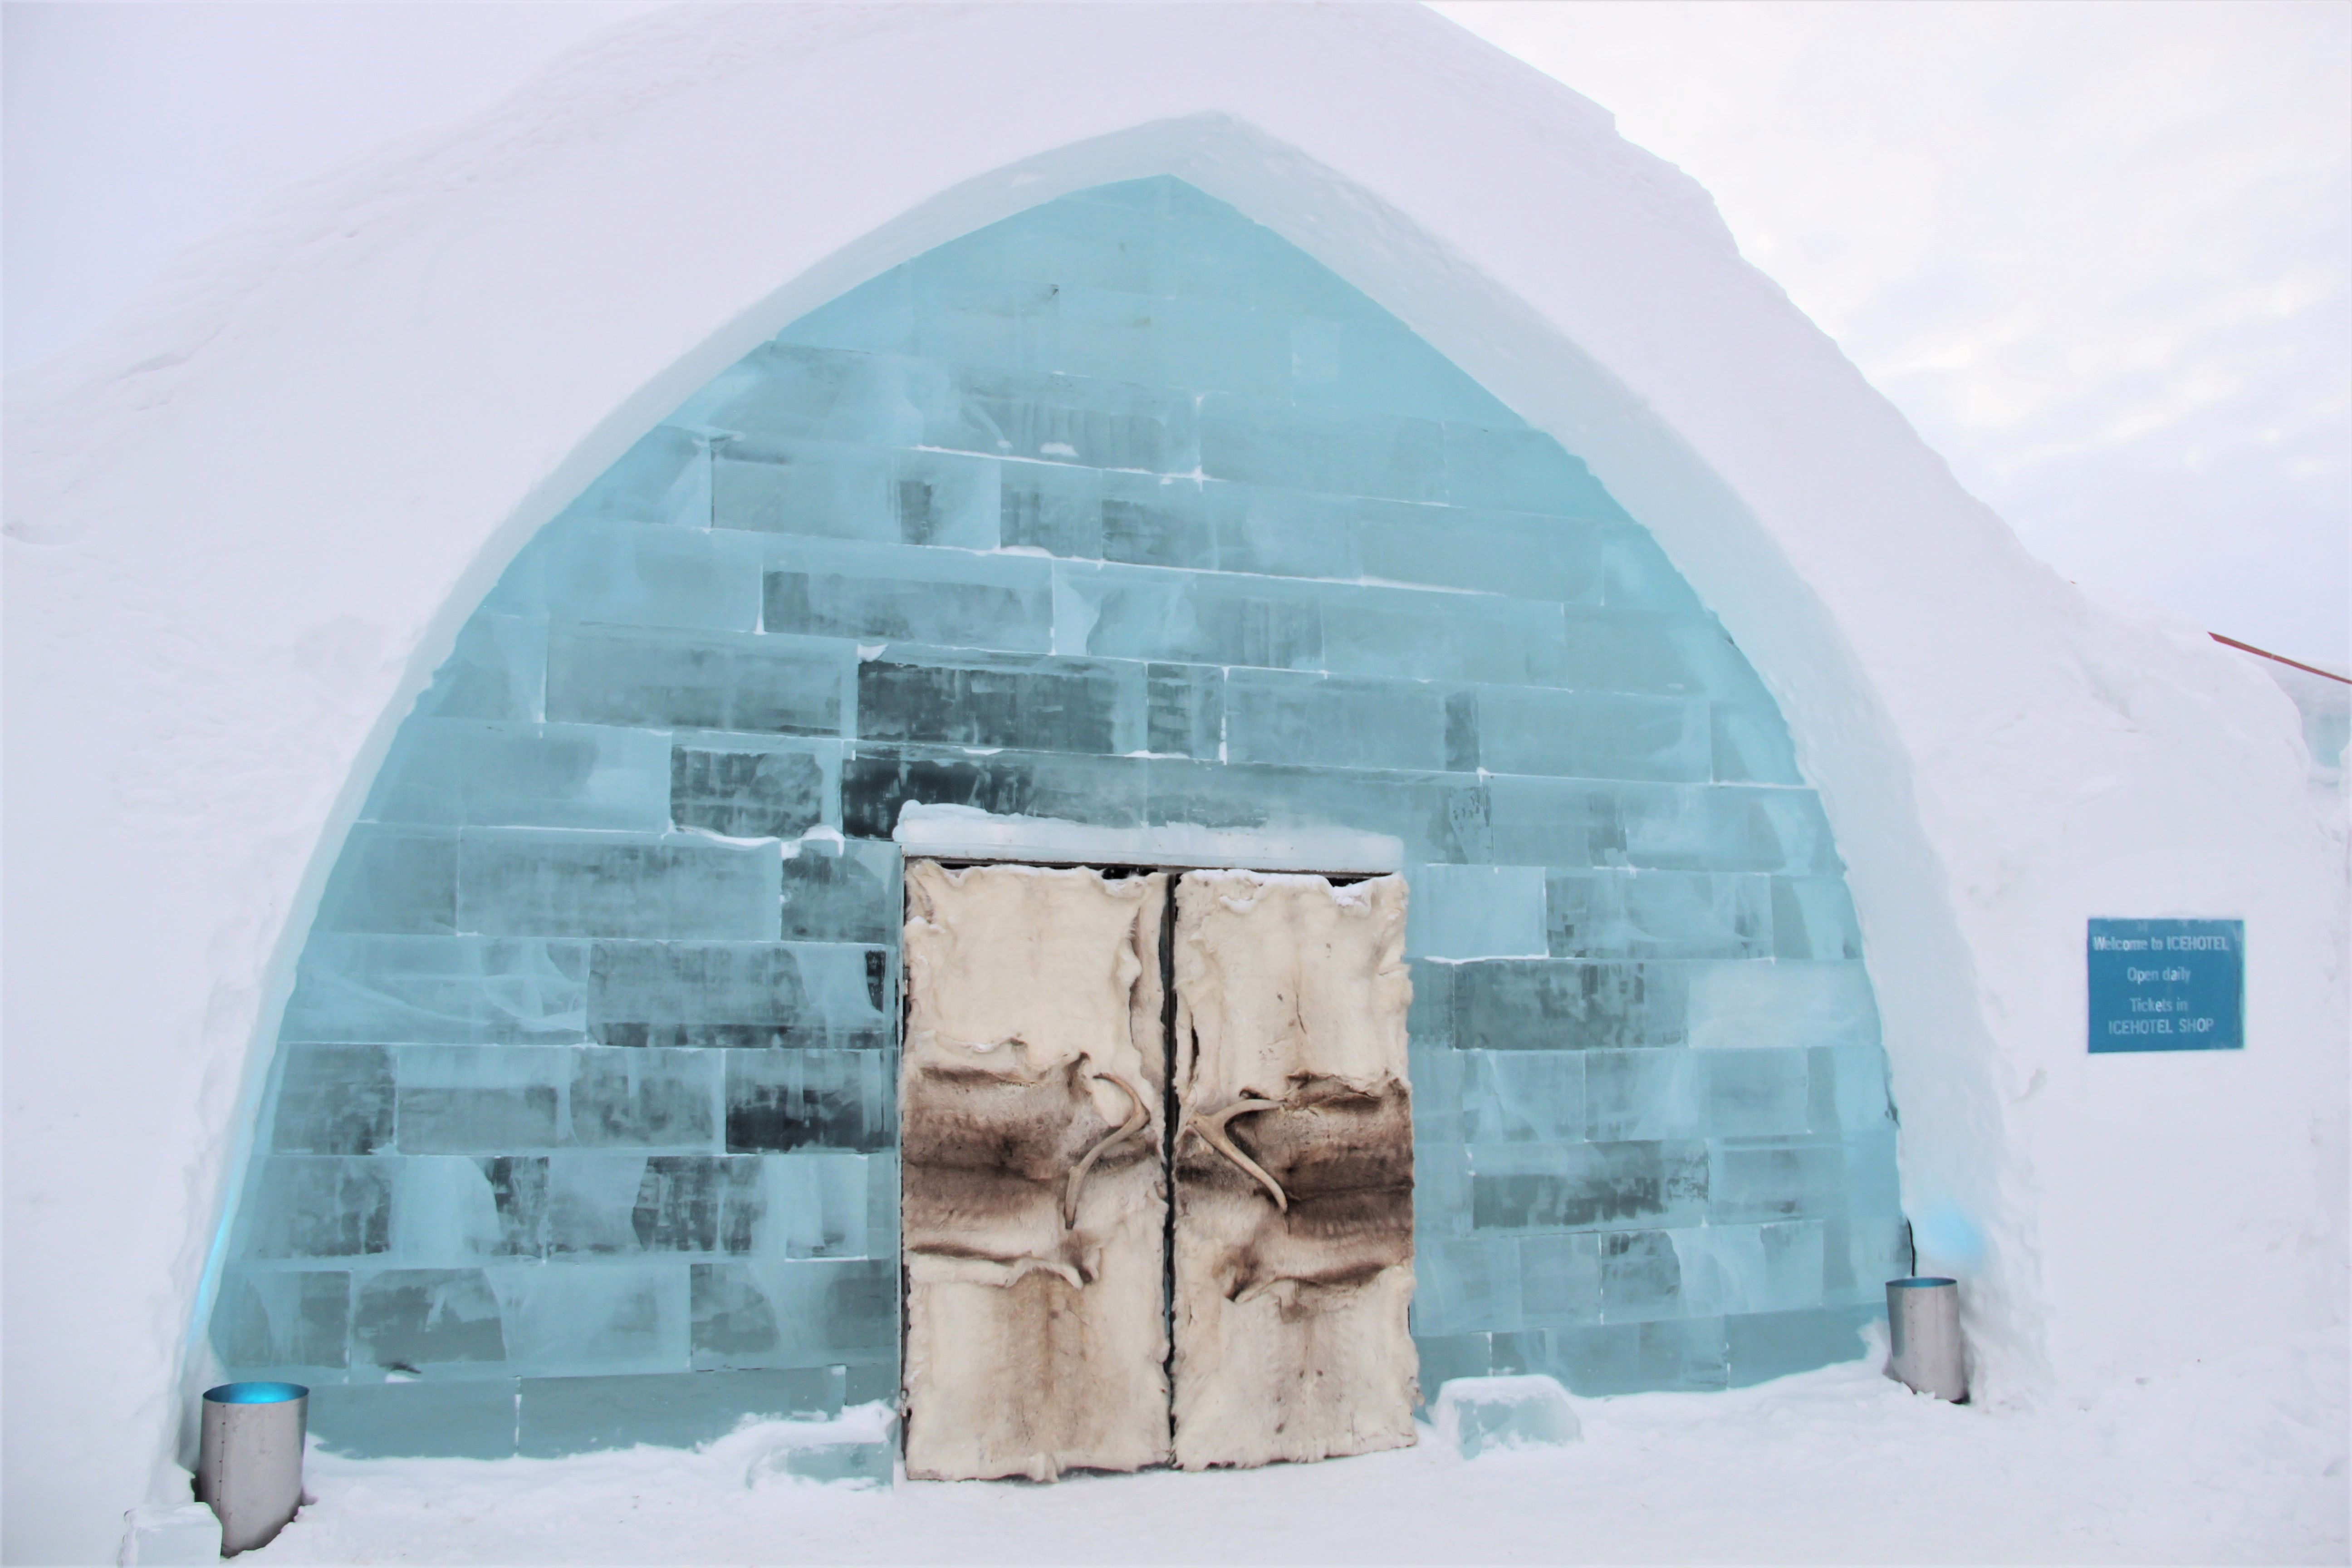 entree-hotel-glace-kiruna-suede-mylittleroad